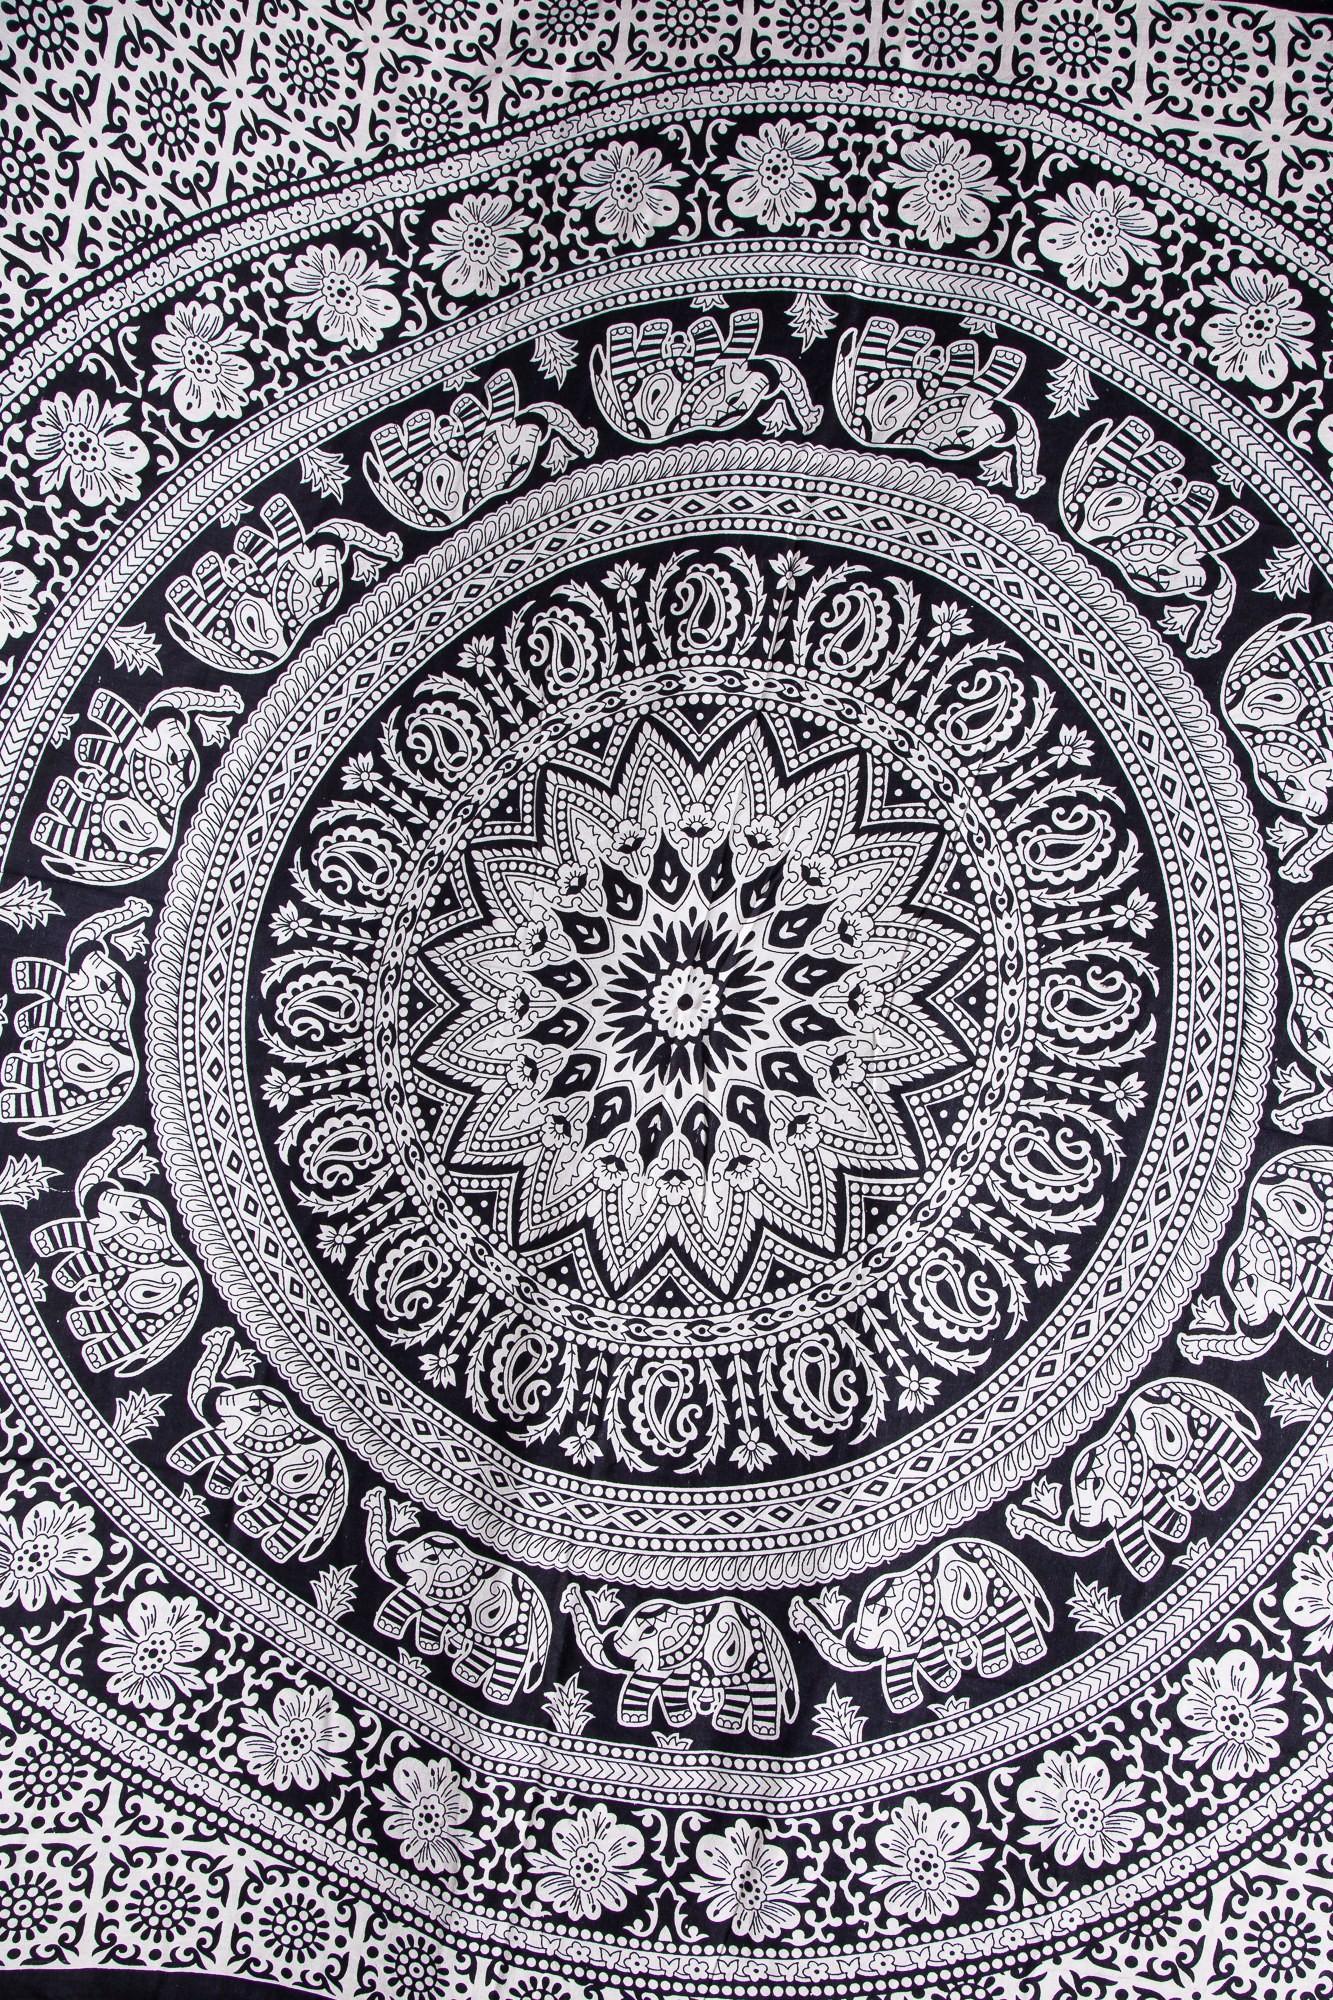 Cuvertura alba cu imprimeu floral si bordura neagra-single